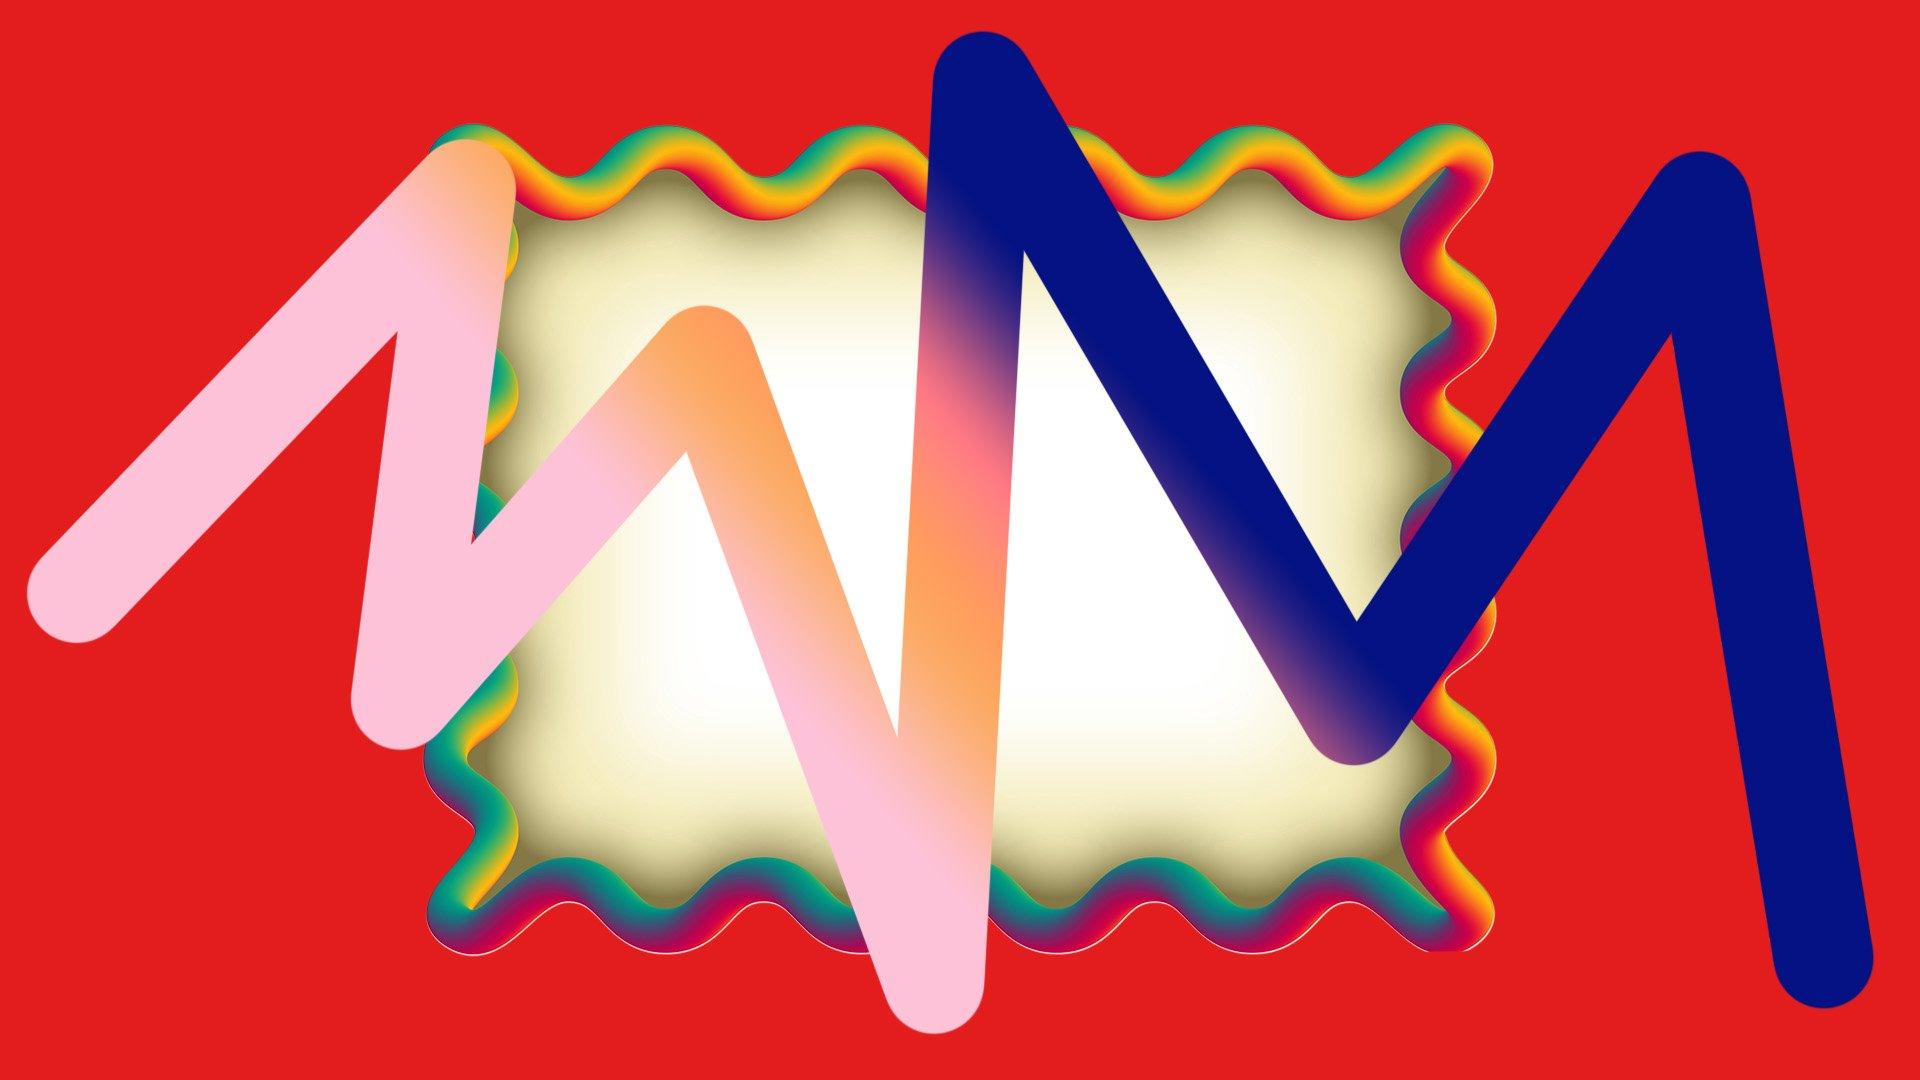 NFT platform Art Blocks breaks record with $5.8 million sale